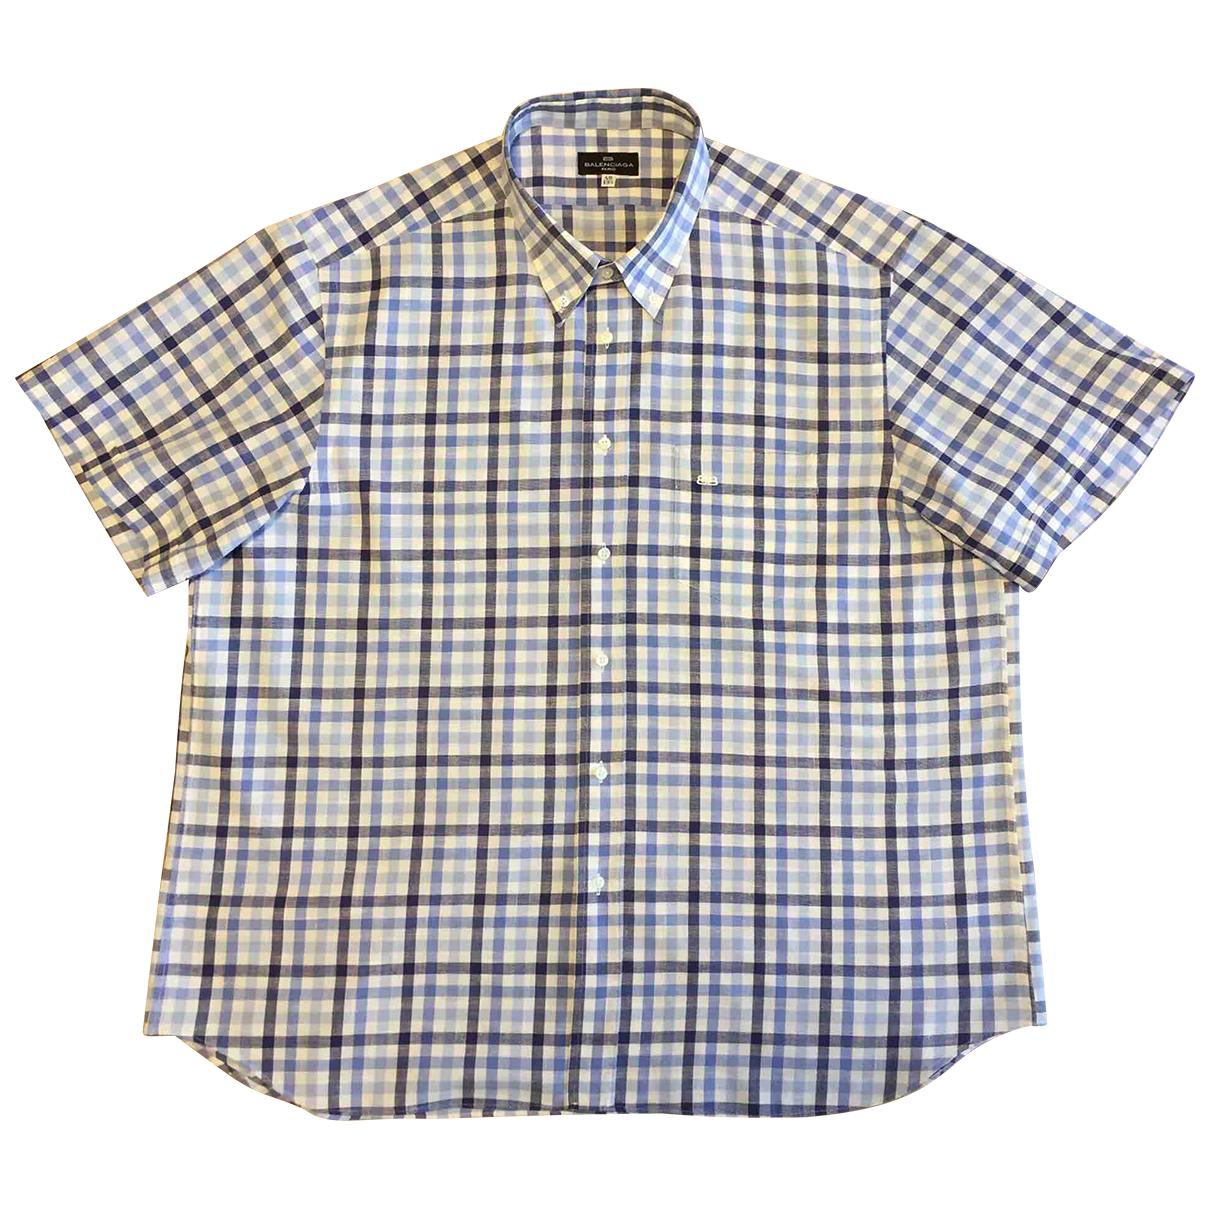 Balenciaga - Chemises   pour homme en lin - bleu